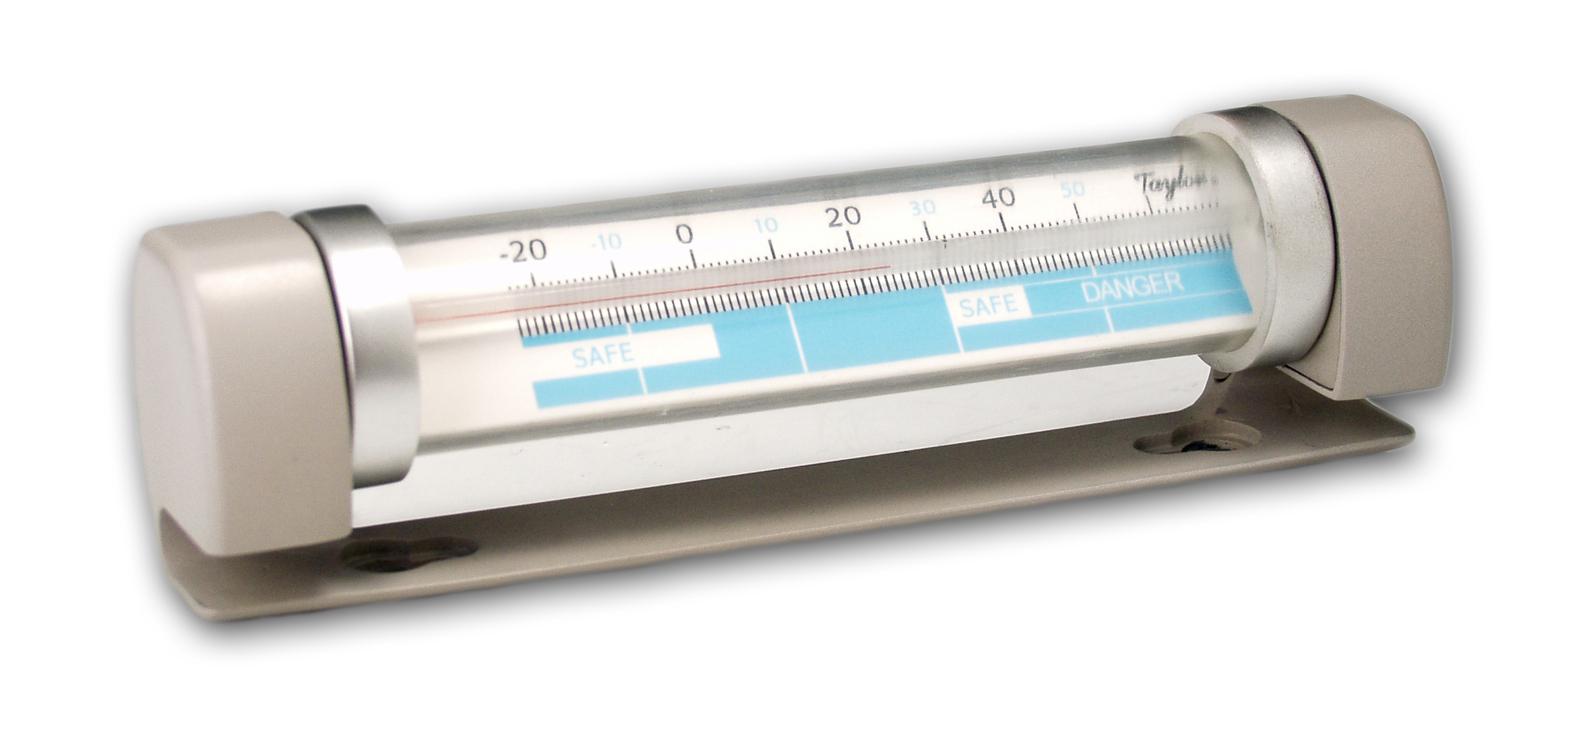 Taylor Refrigerator & Freezer Tilt Tube Thermometer